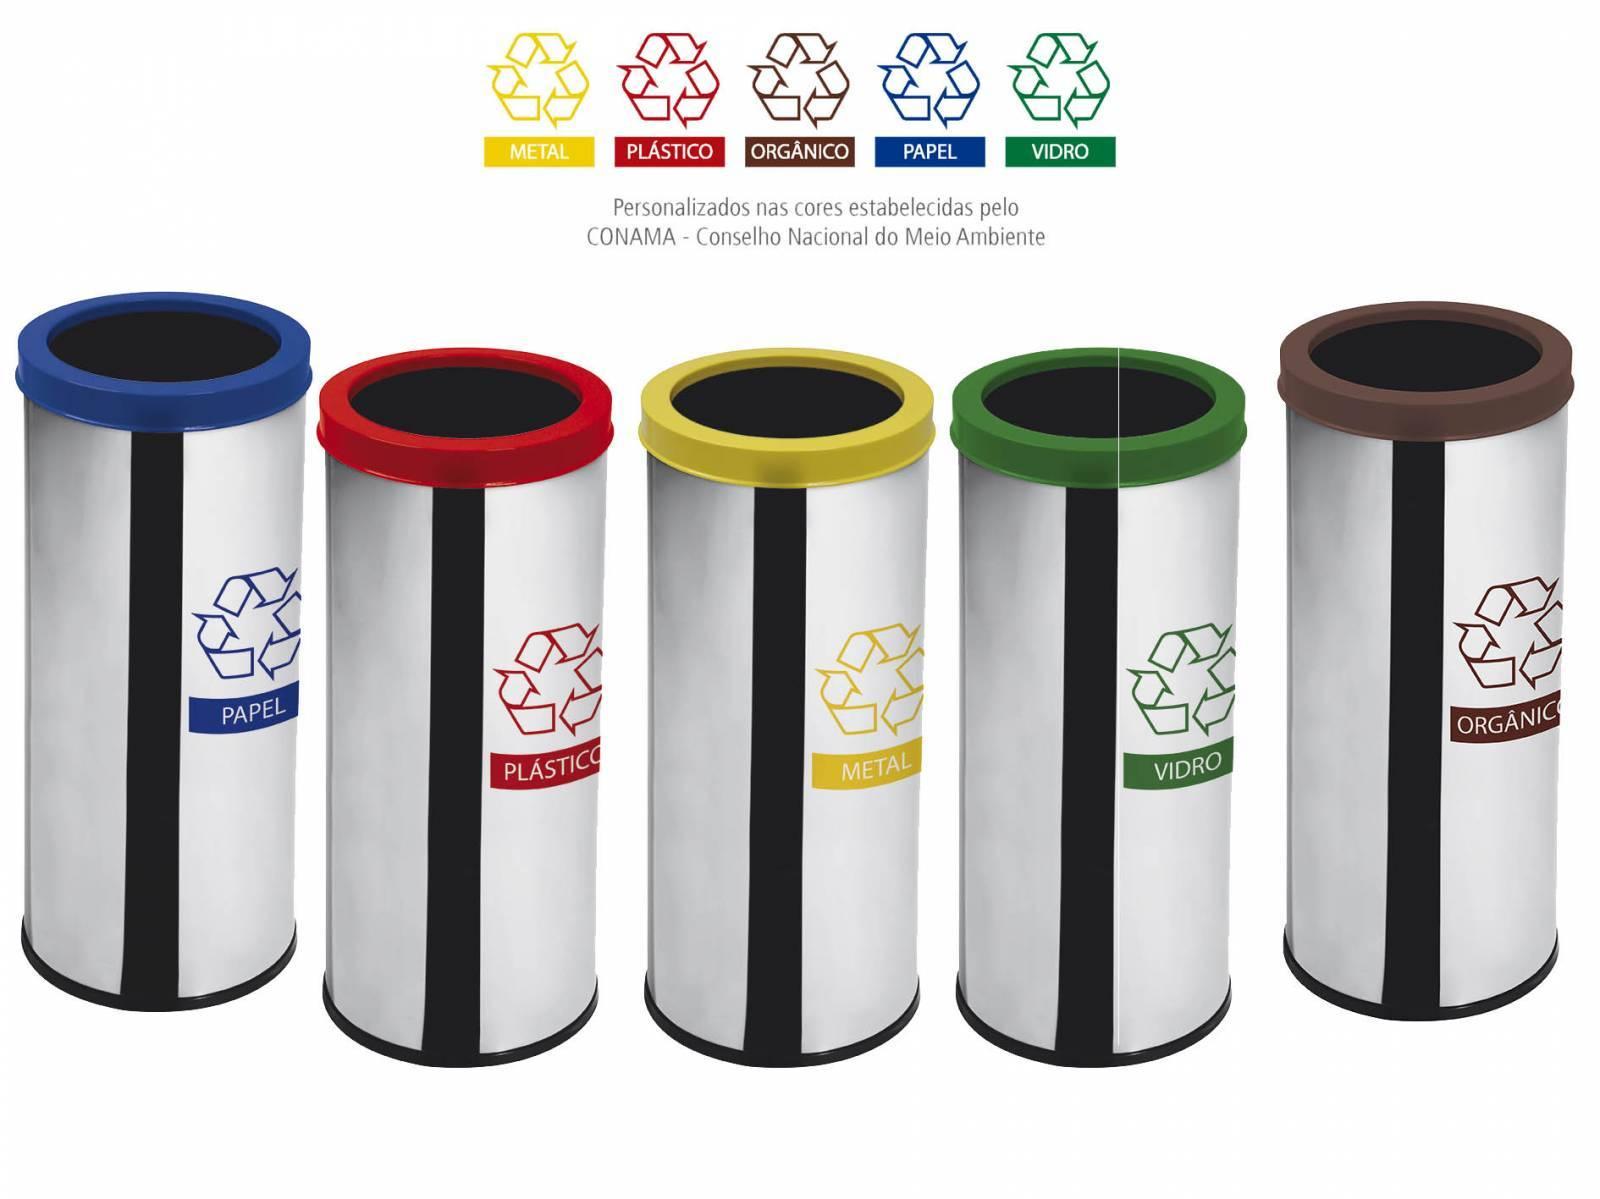 Lixeira Seletiva Inox 30 cm x 70 cm C/ Aro Colorido - 50 Litros (Unidade)